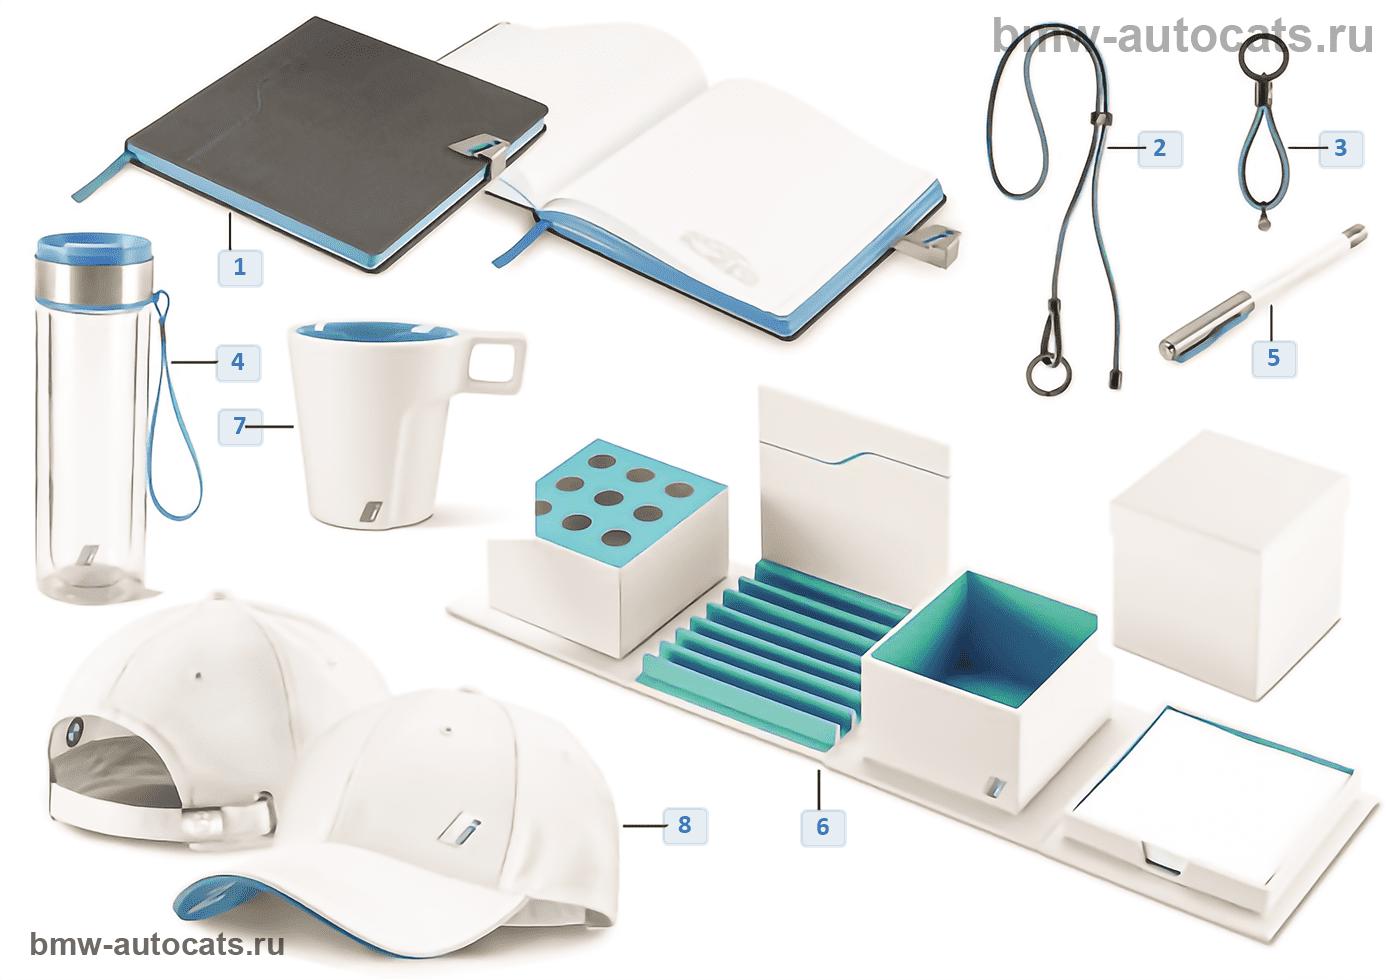 BMW i Collection — Аксессуары 16-18